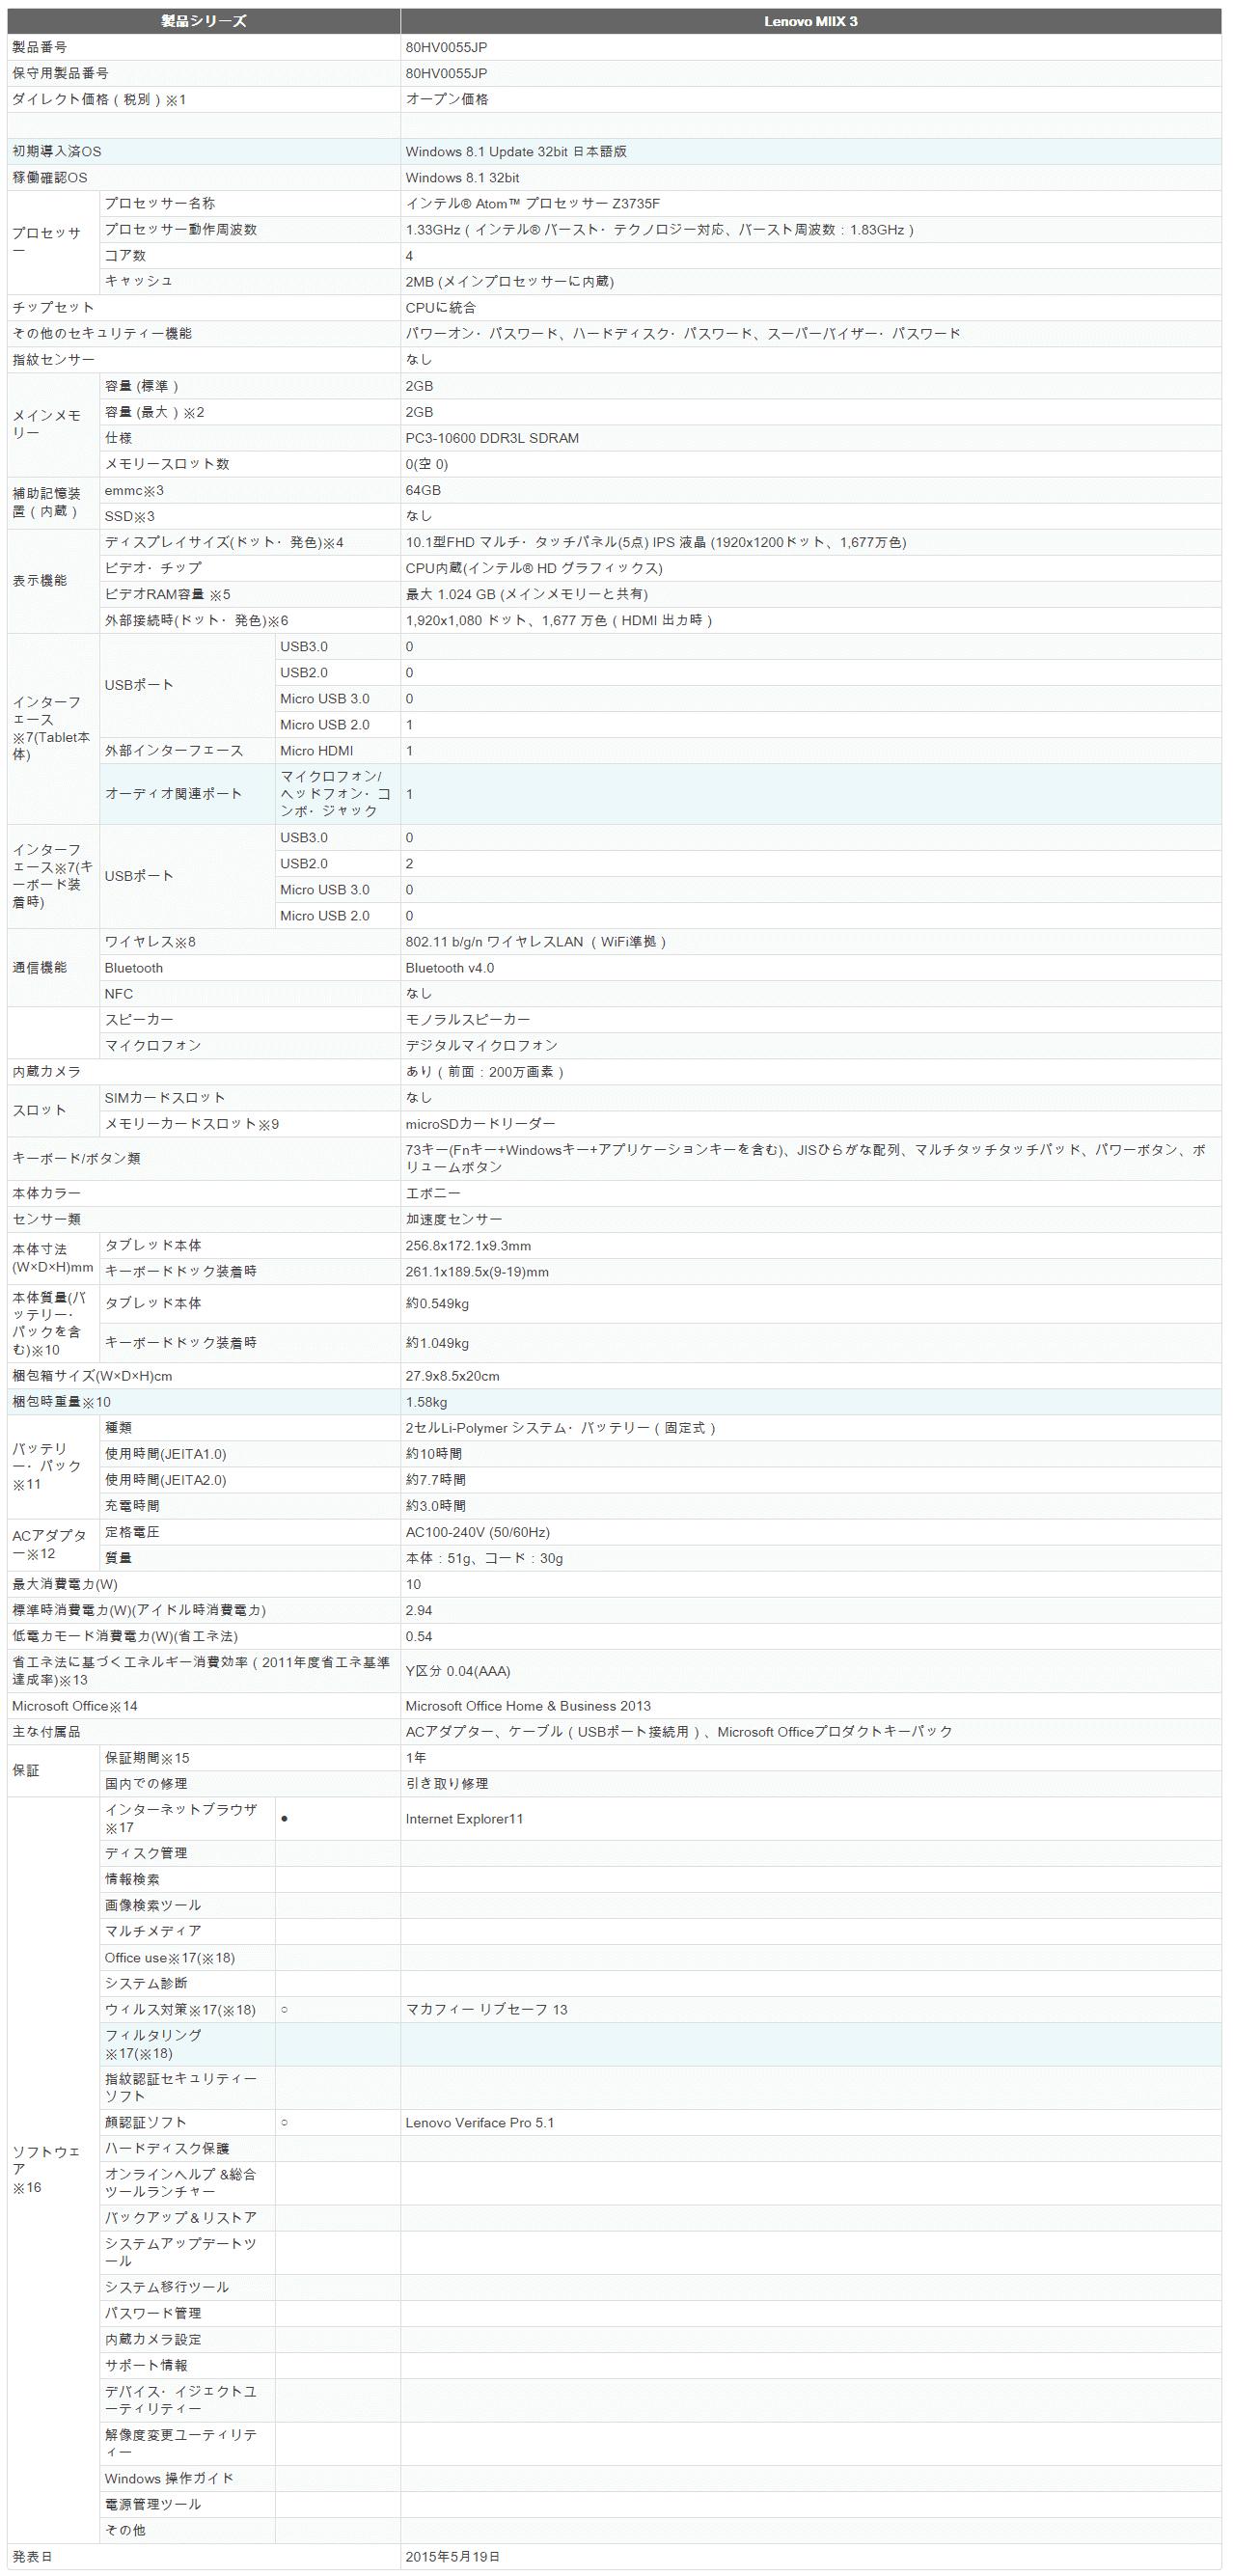 Lenovo Miix 3 10 スペック表